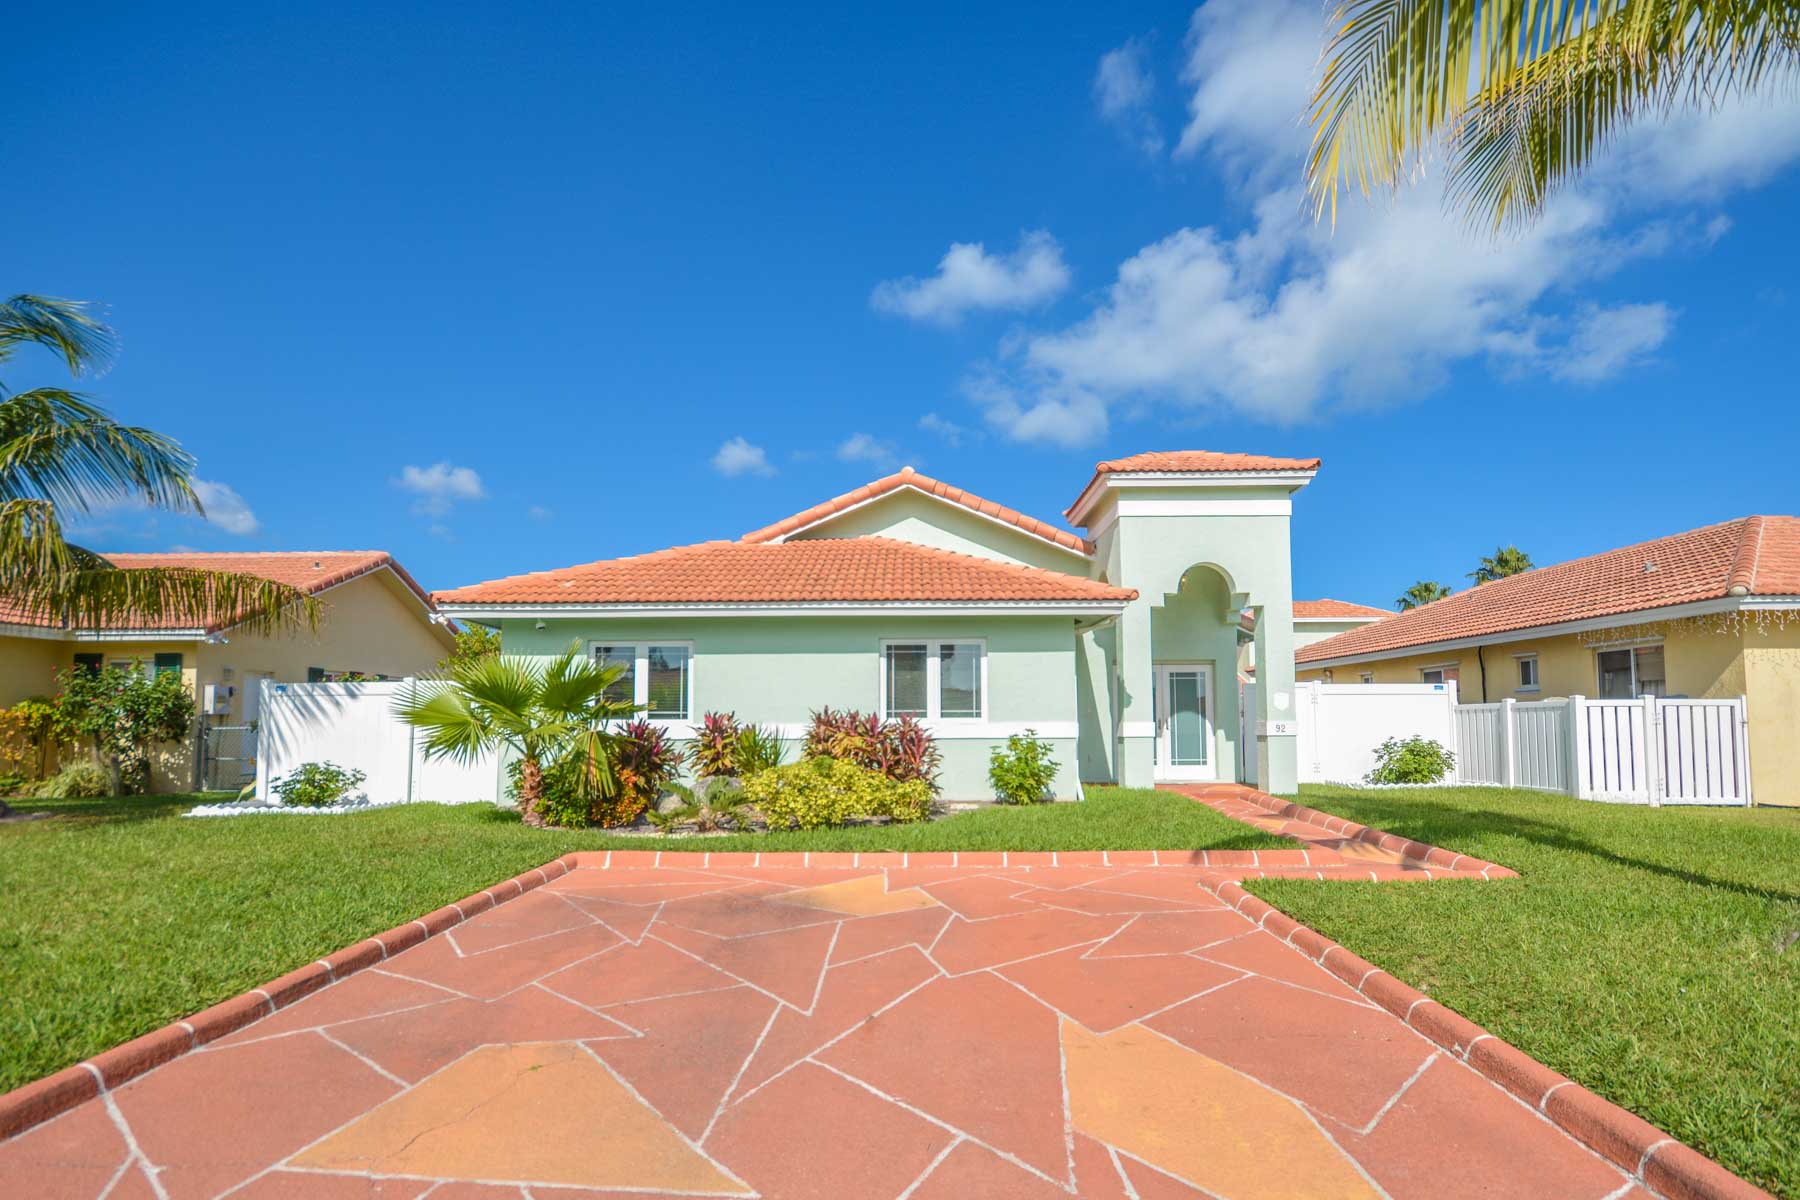 Single Family Home for Sale at Ideal Family Home In Treasure Cove - MLS 32236 Treasure Cove, Yamacraw, Nassau And Paradise Island Bahamas